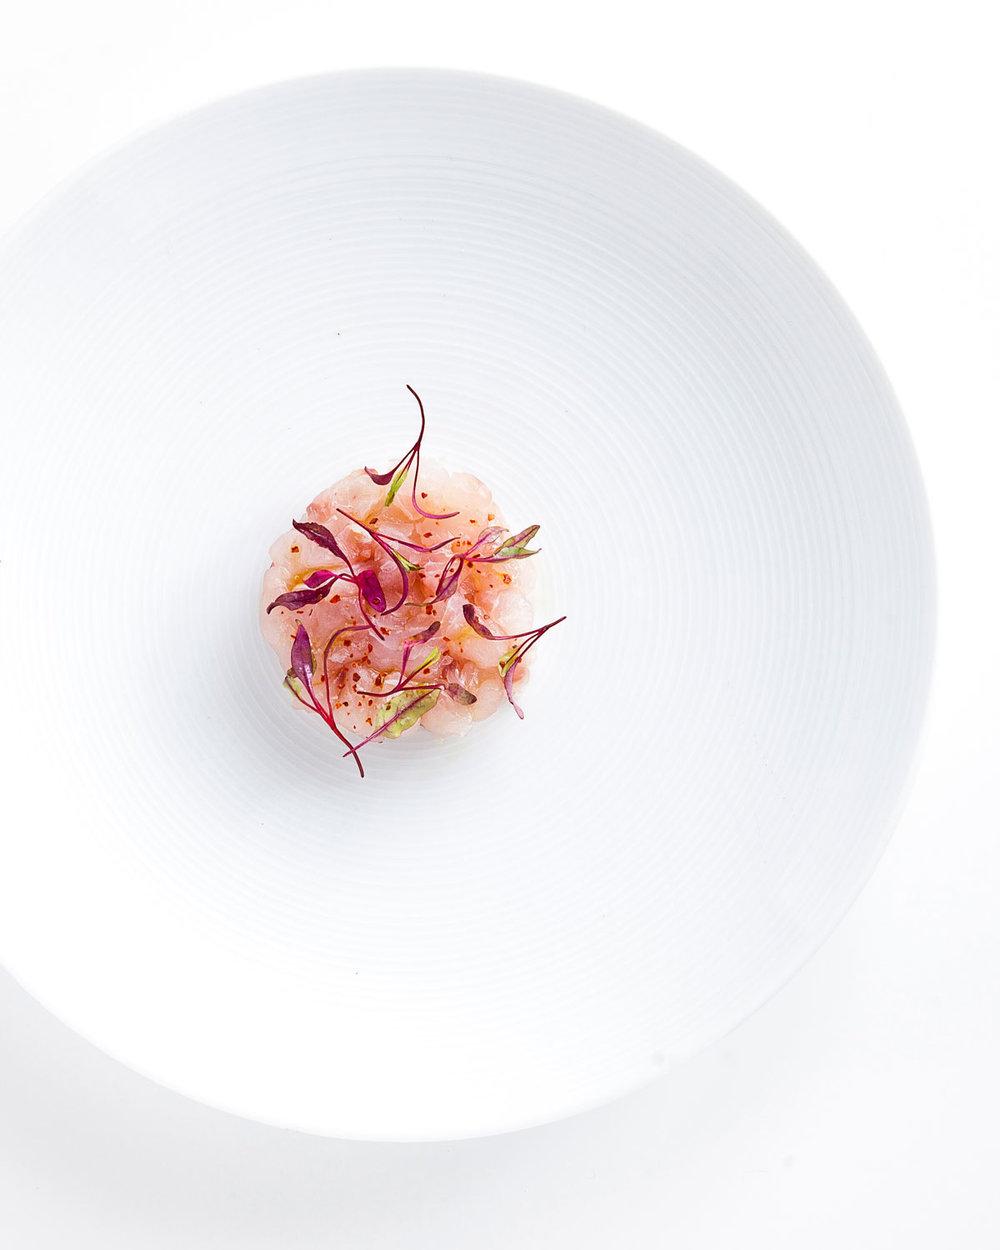 Ceviche-highres_vert.jpg